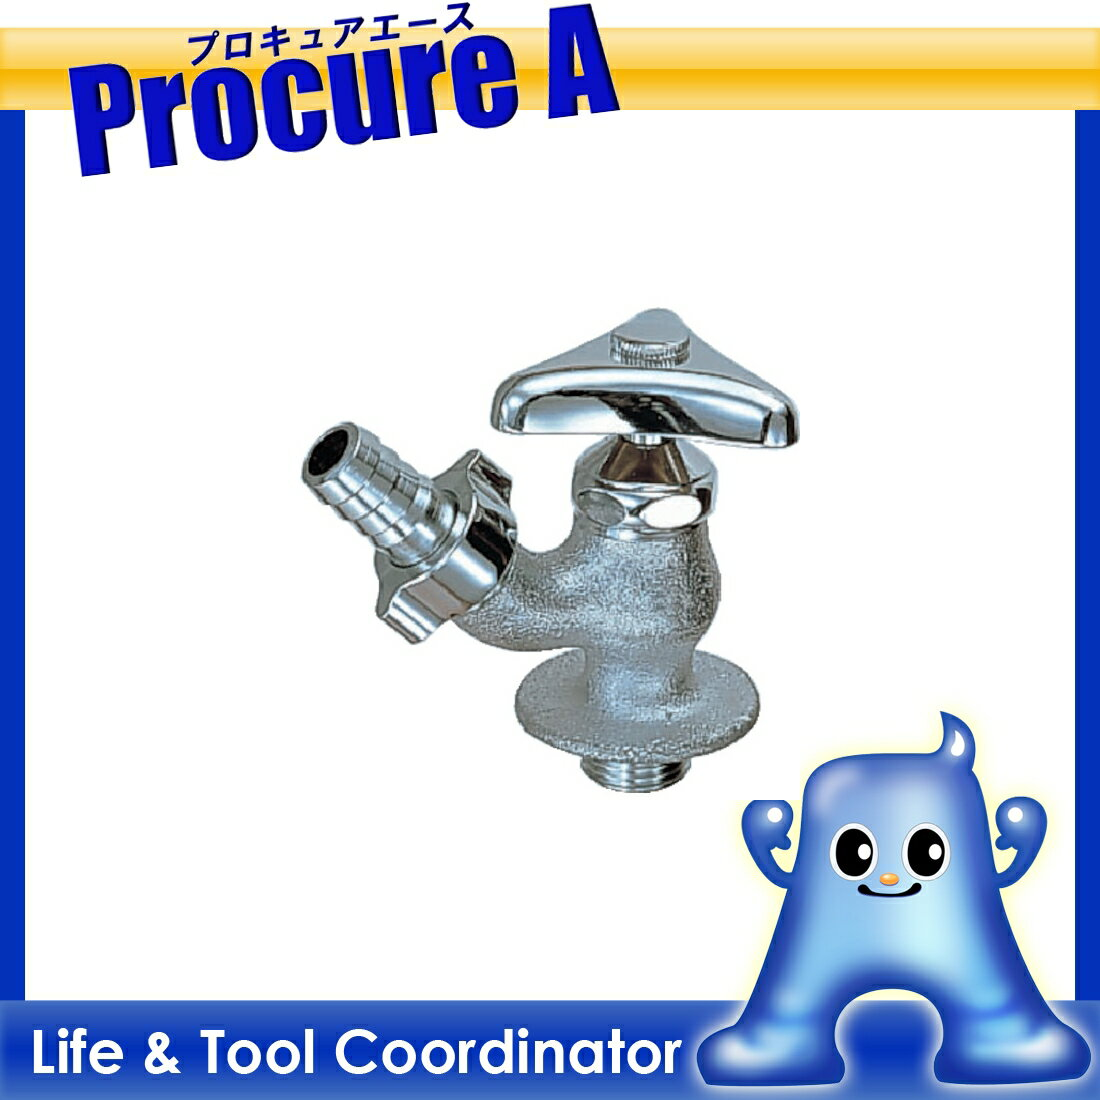 INAX 散水栓 13mm LF-13-13-CV ▼331-6602 (株)LIXIL 住設ルート 【代引決済不可】